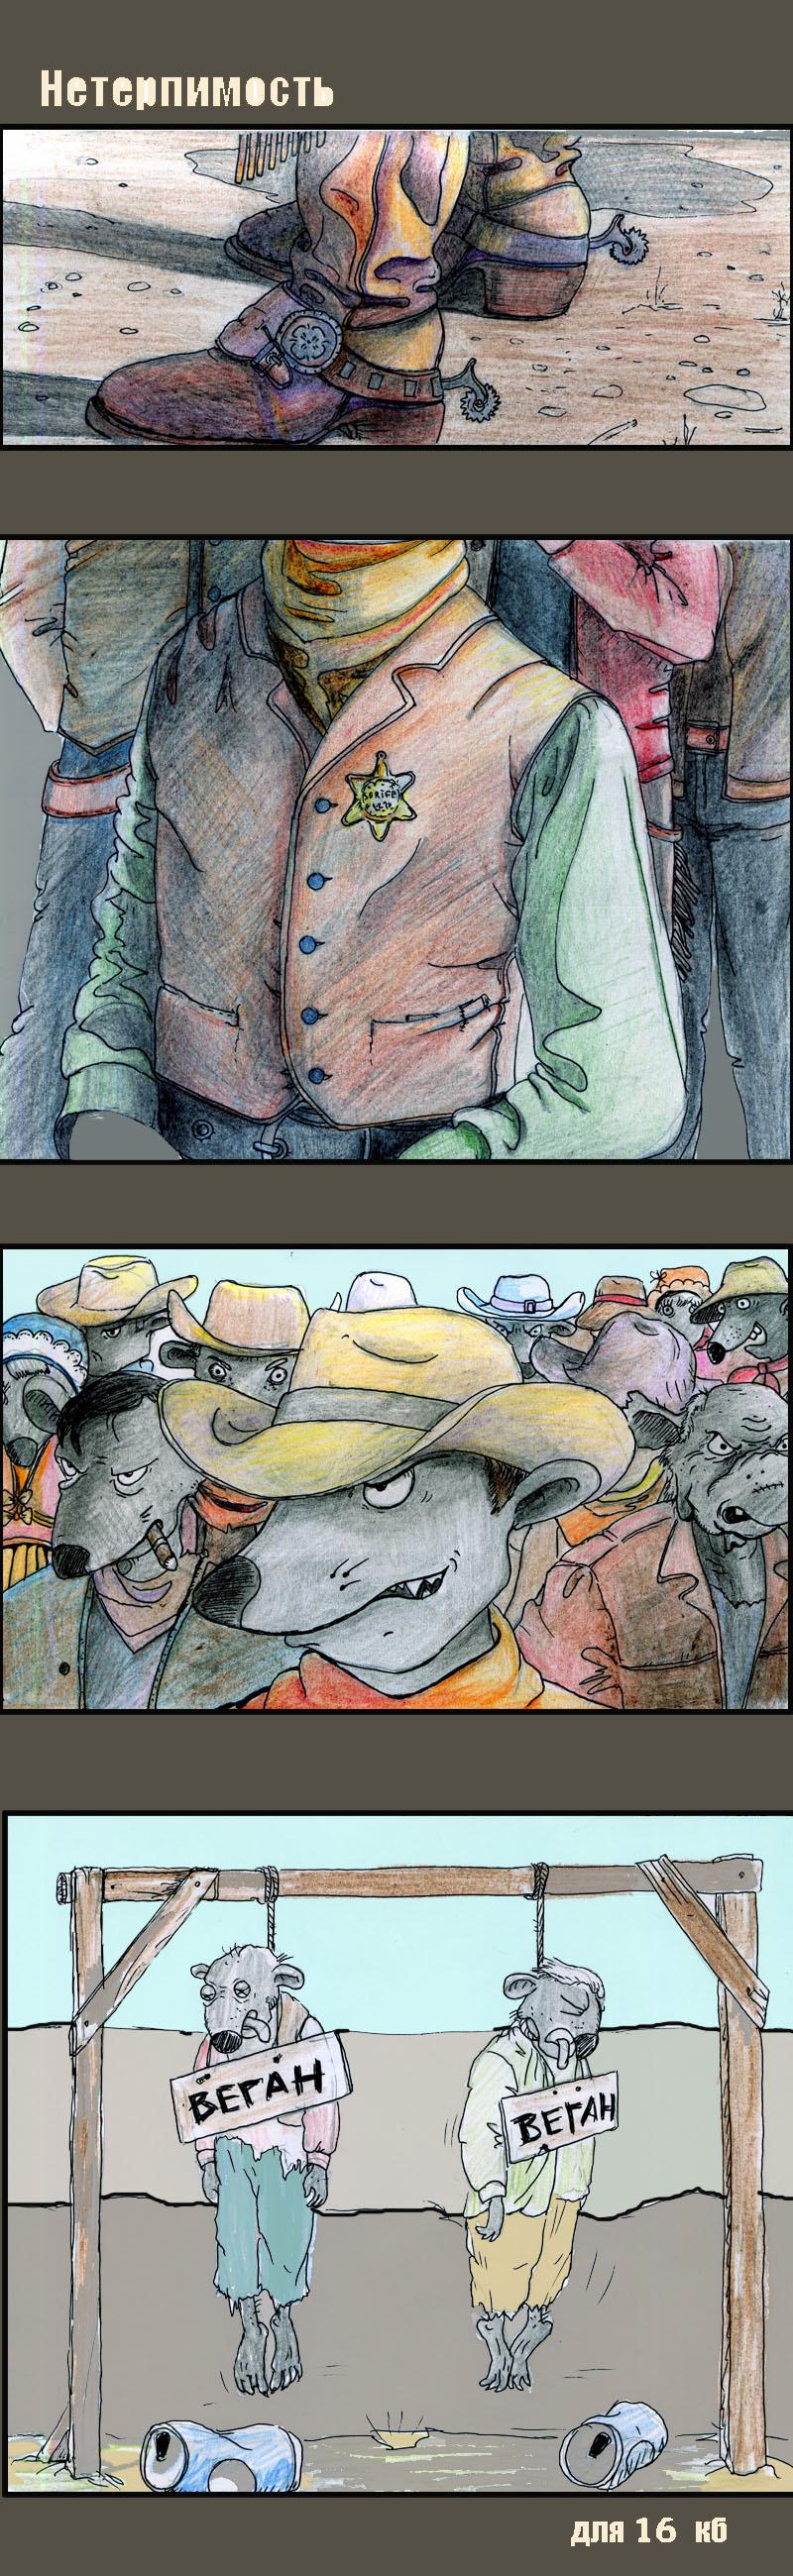 Комикс битва №16 выпуск 60